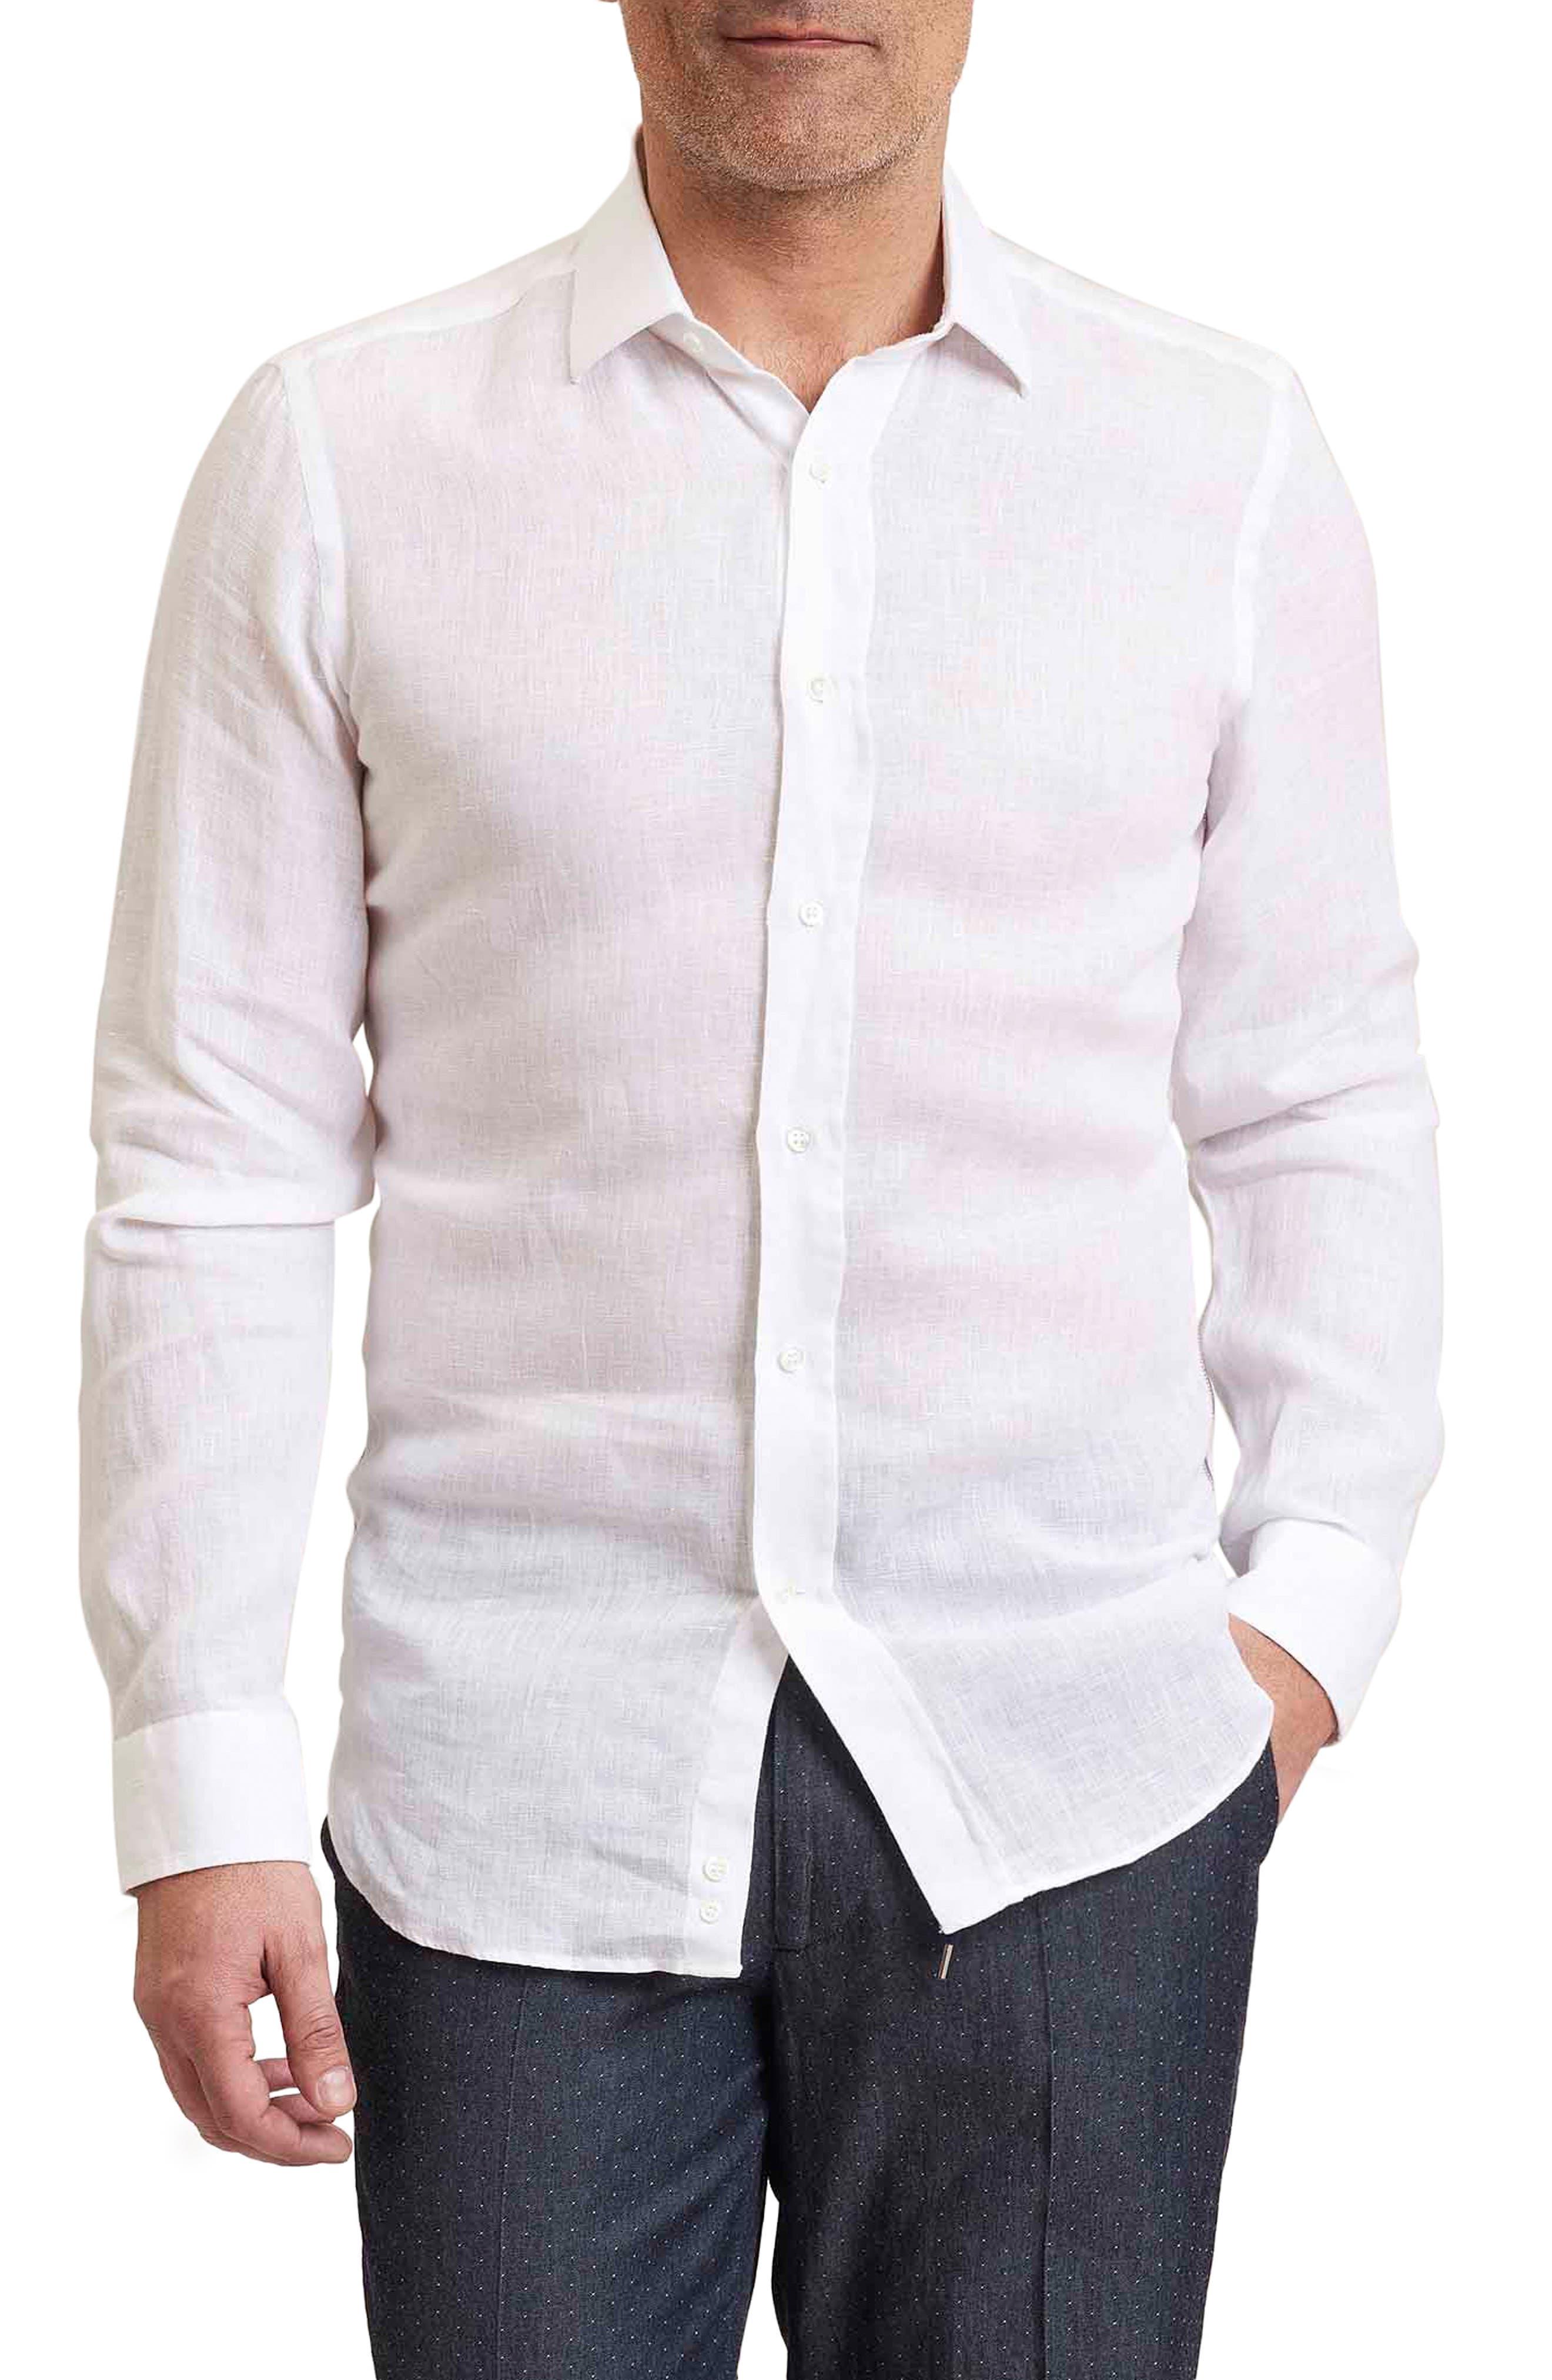 Delave Regular Fit Linen Sport Shirt,                         Main,                         color, 100